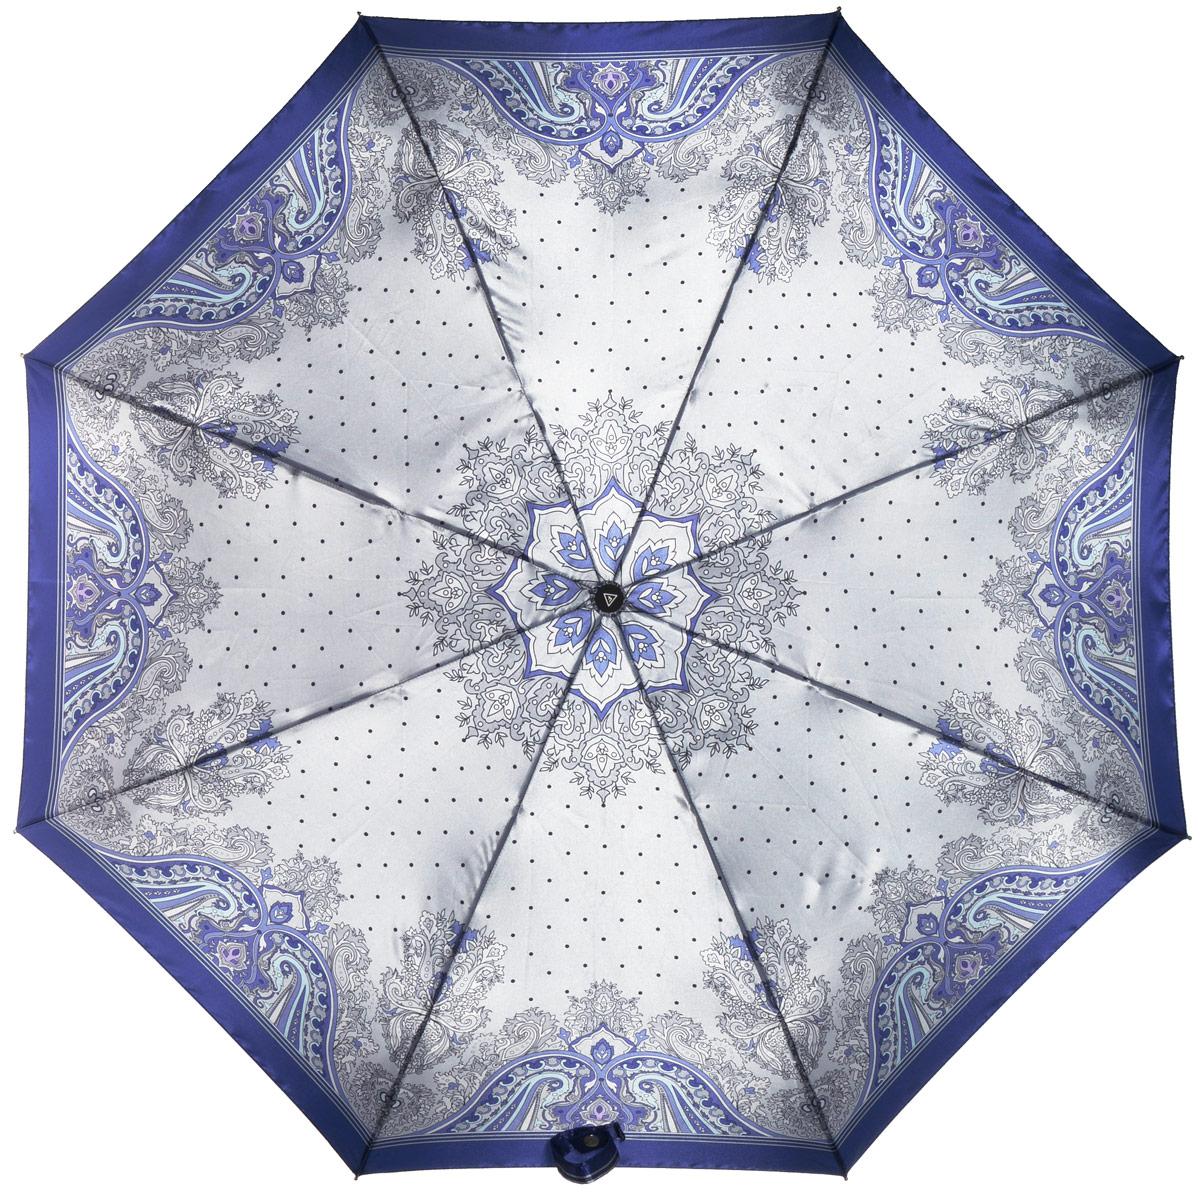 Зонт женский Fabretti, автомат, 3 сложения, цвет: мультиколор. L-16104-4L-16104-4Зонт женский Fabretti, облегченный суперавтомат, 3 сложения